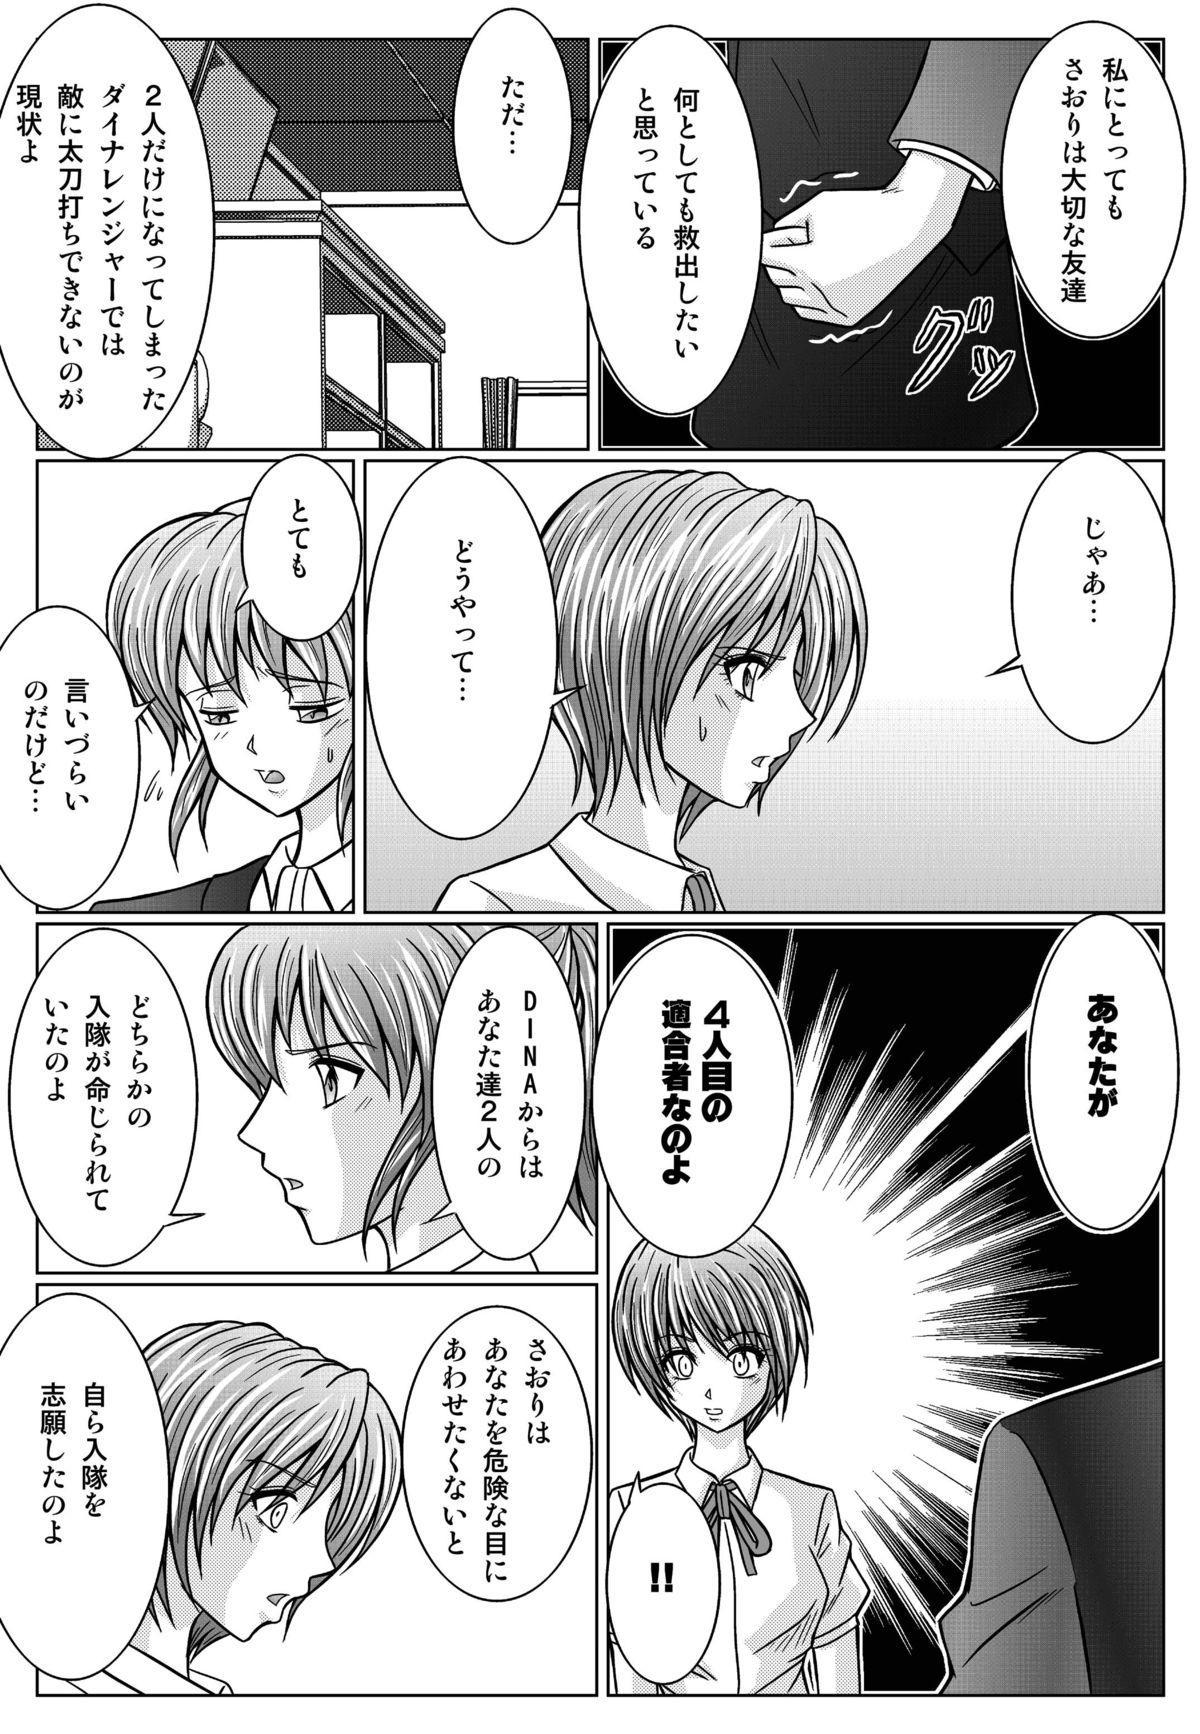 [Macxe's (monmon)] Tokubousentai Dinaranger ~Heroine Kairaku Sennou Keikaku~ Vol.01/02/03 (Renkaban) [Digital] 78